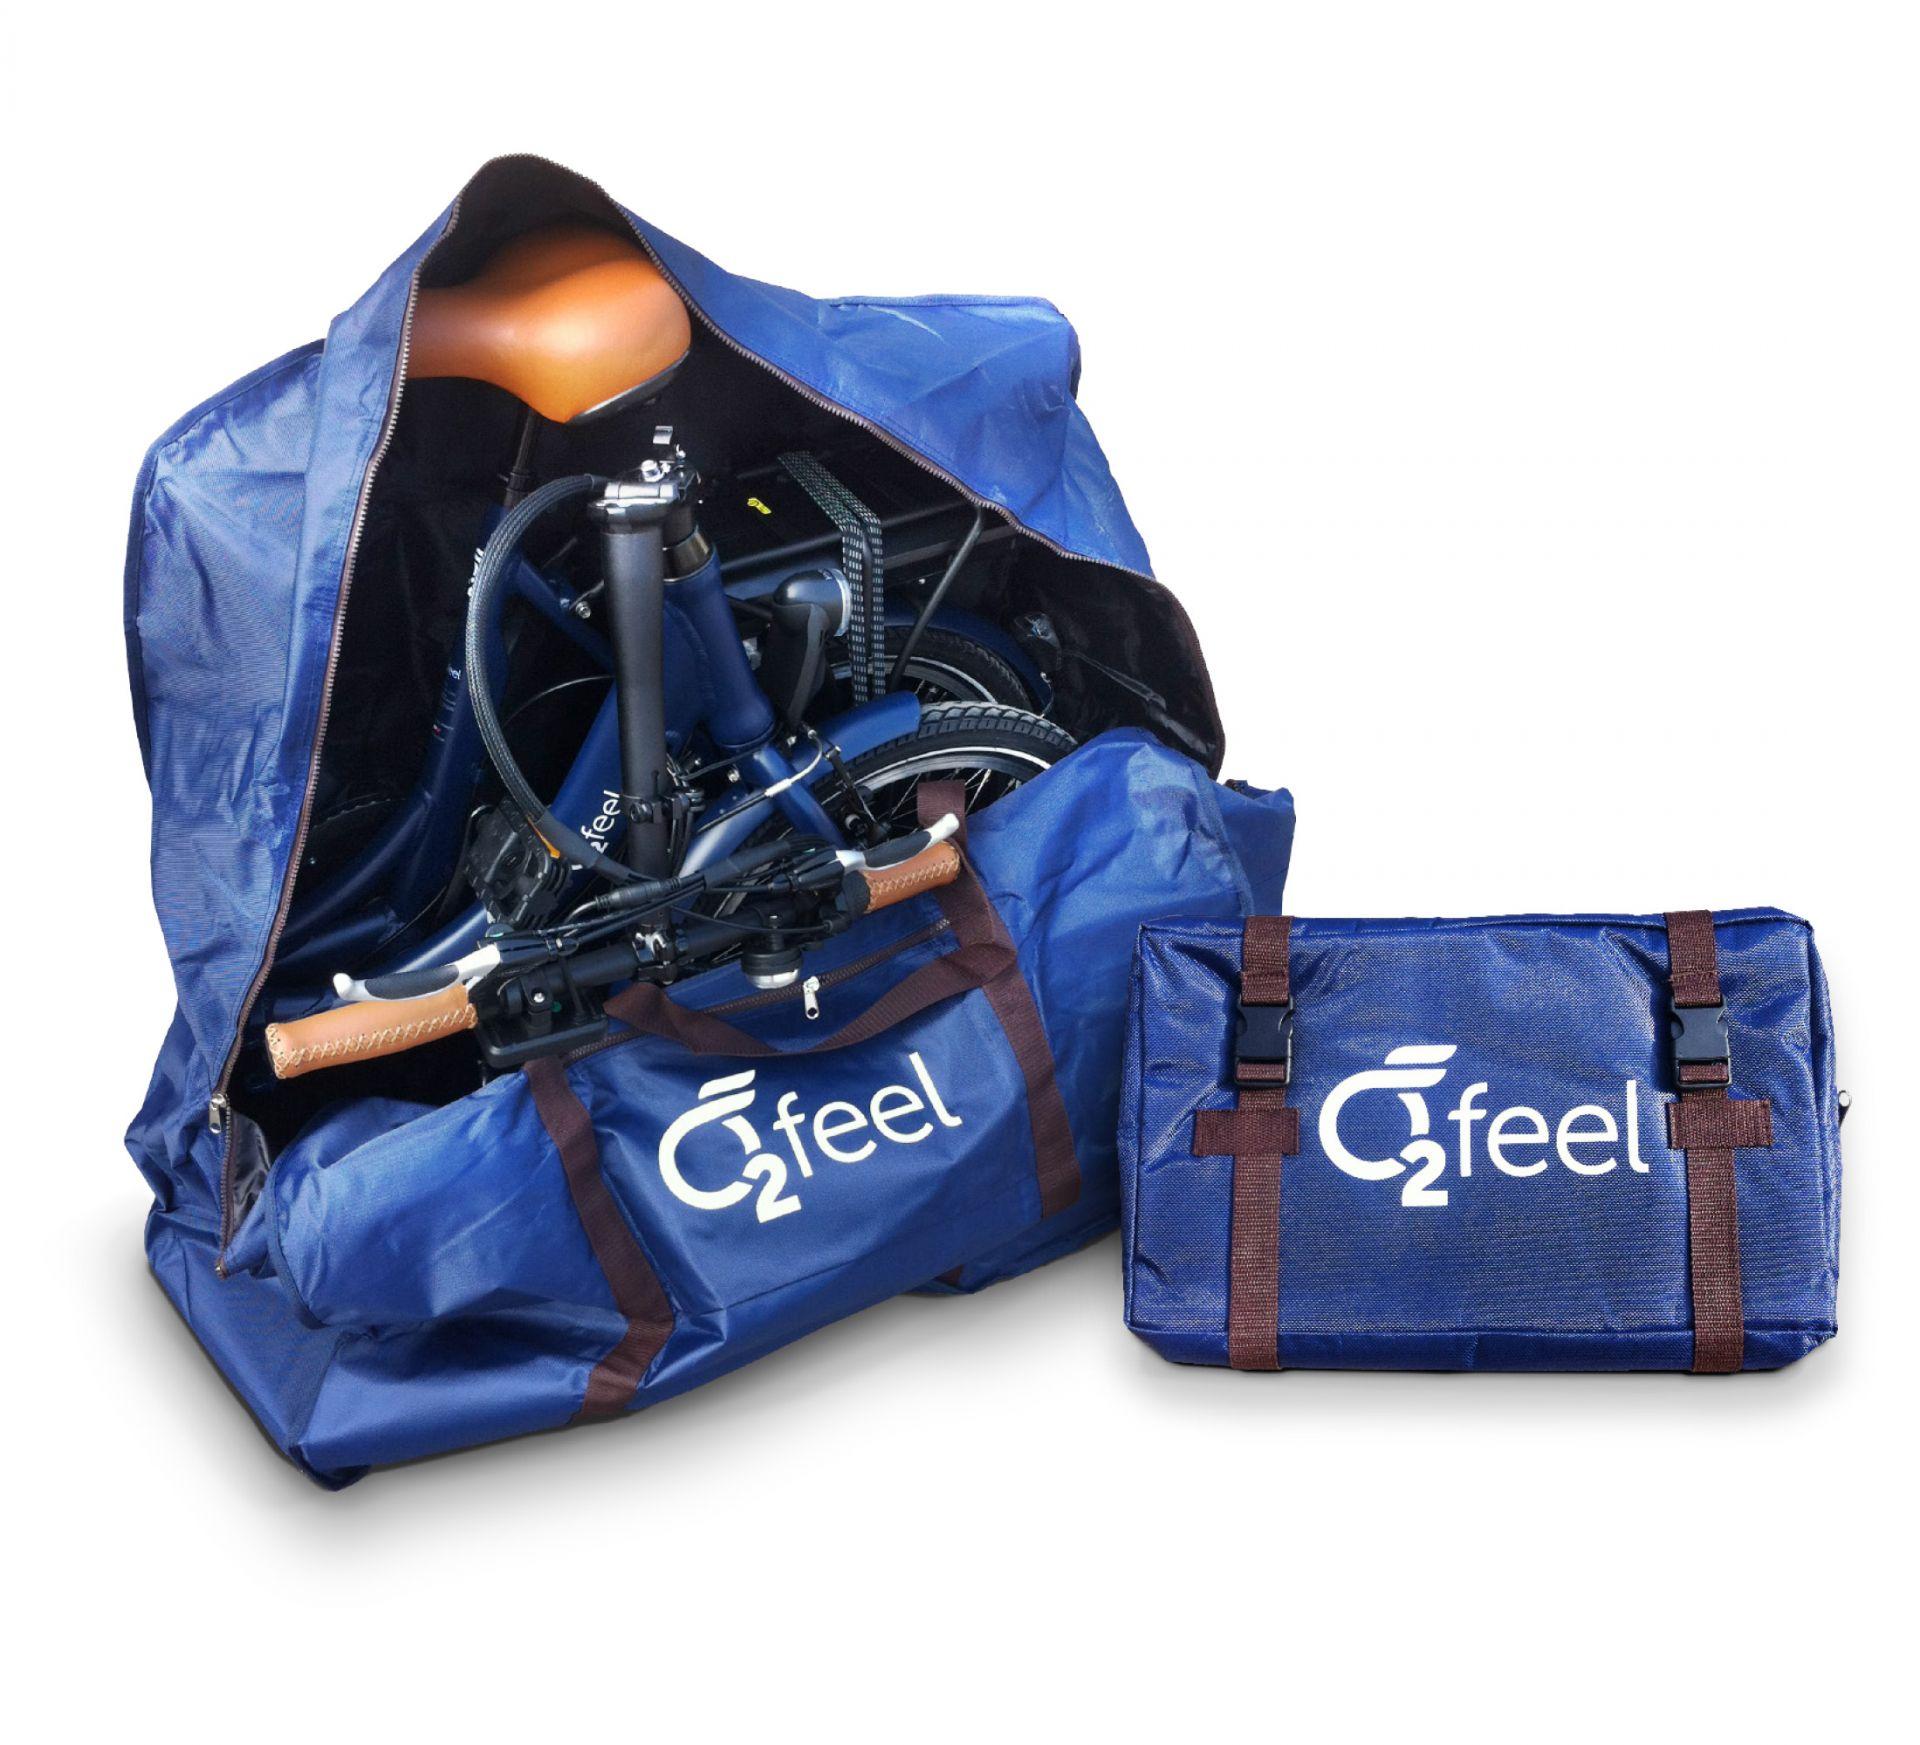 Sac de transport O2Feel PEPS pour vélo pliant